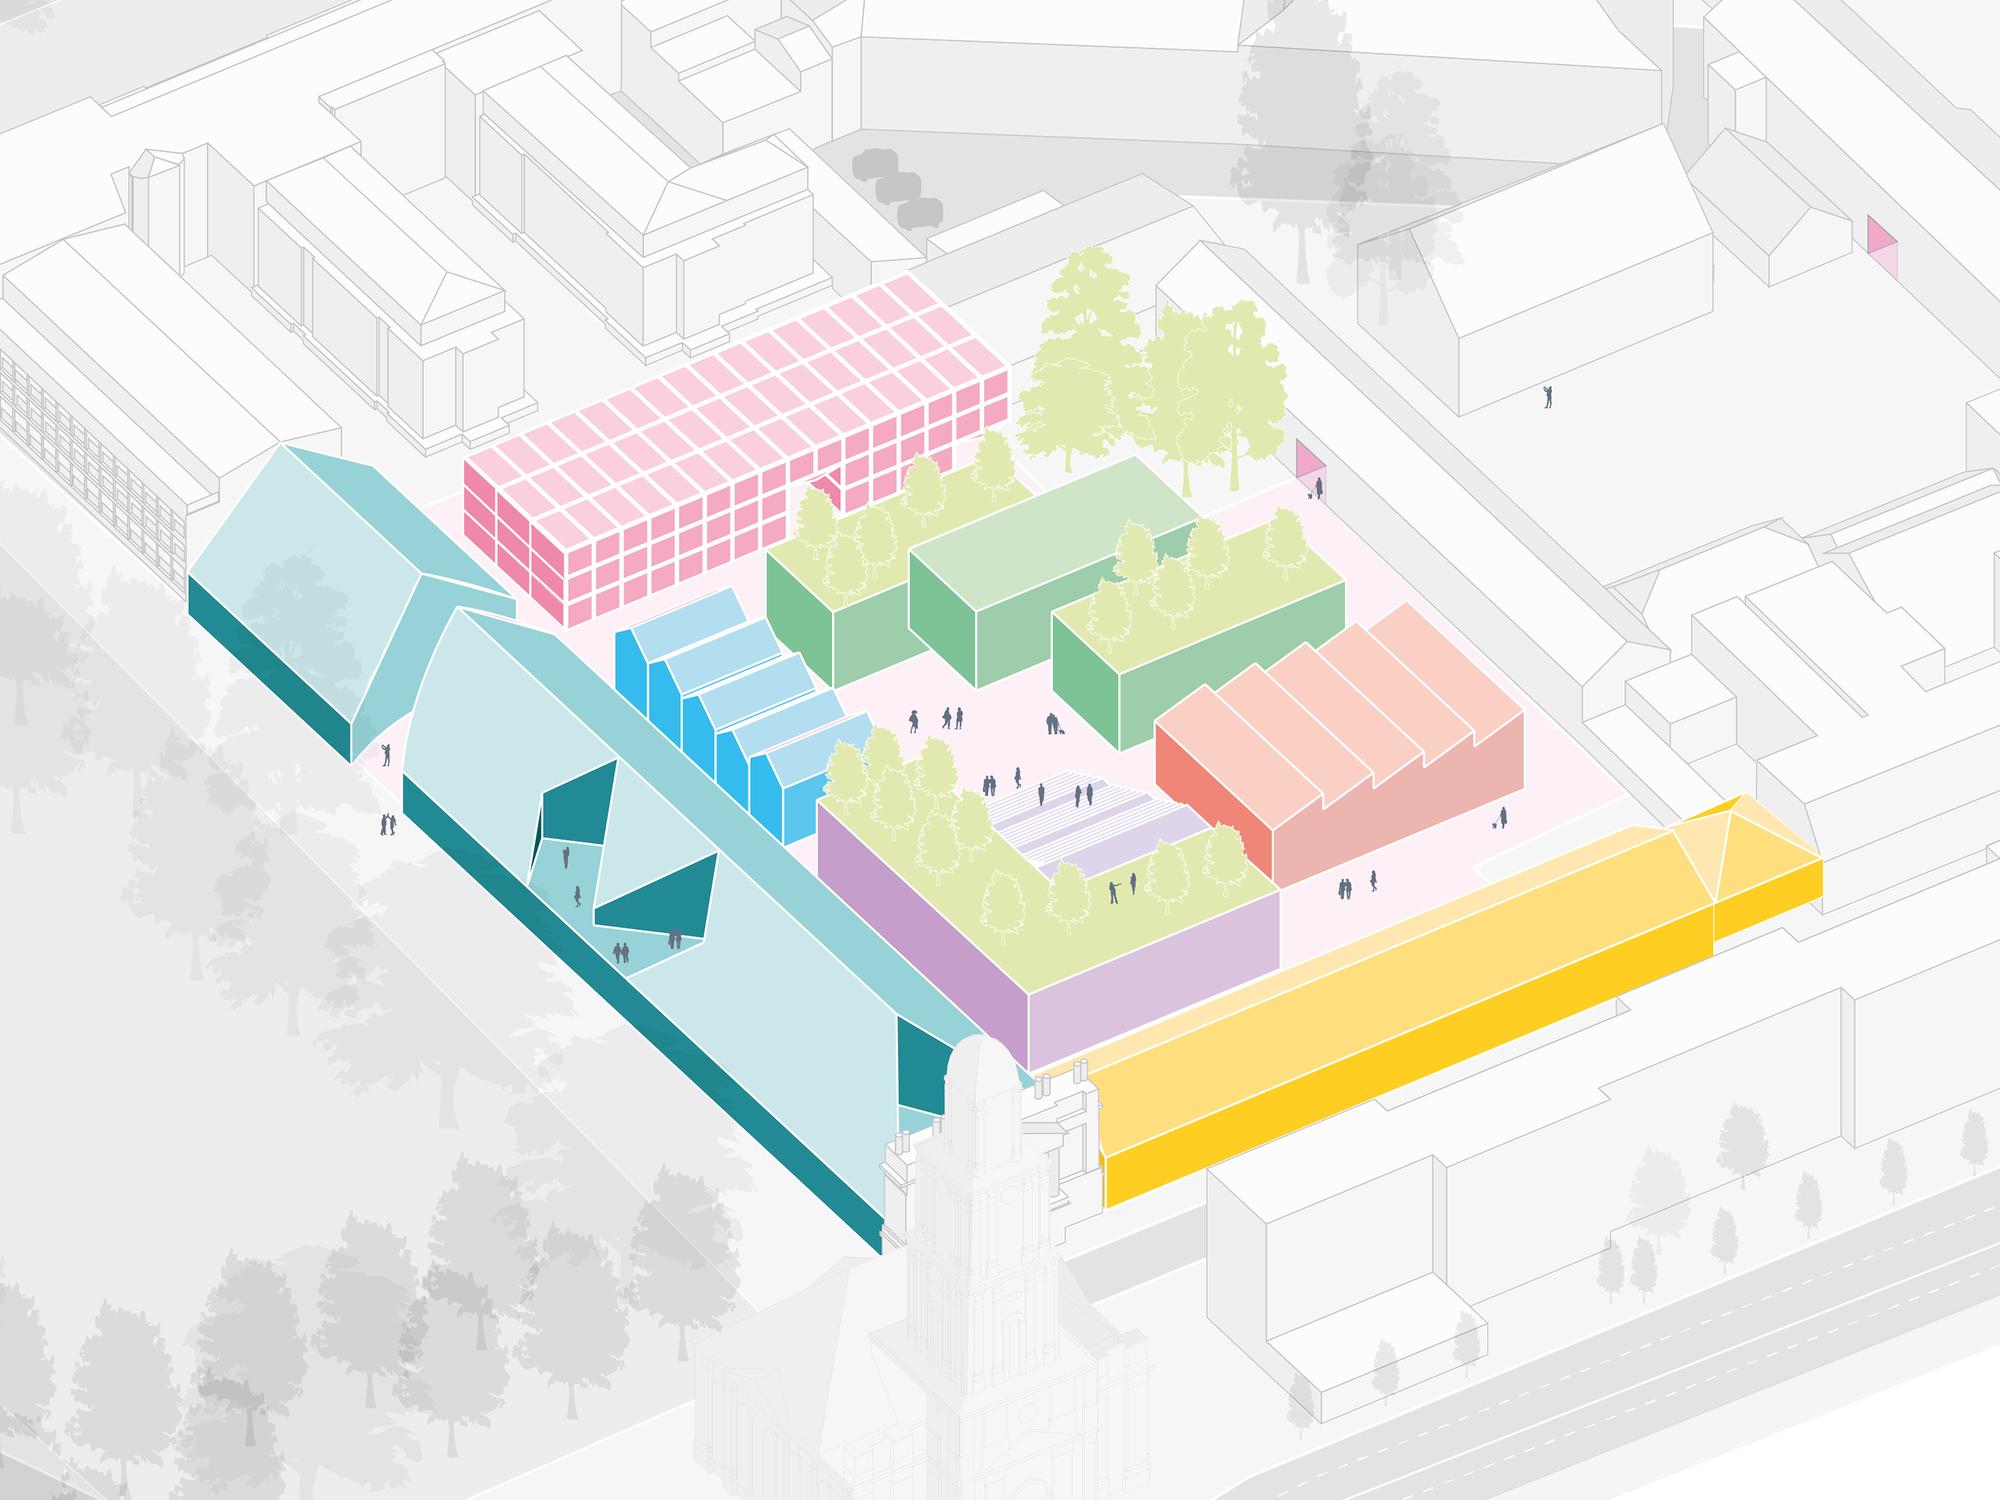 MVRDV Wins Competition to Design Potsdam's Creative Quarter Master Plan